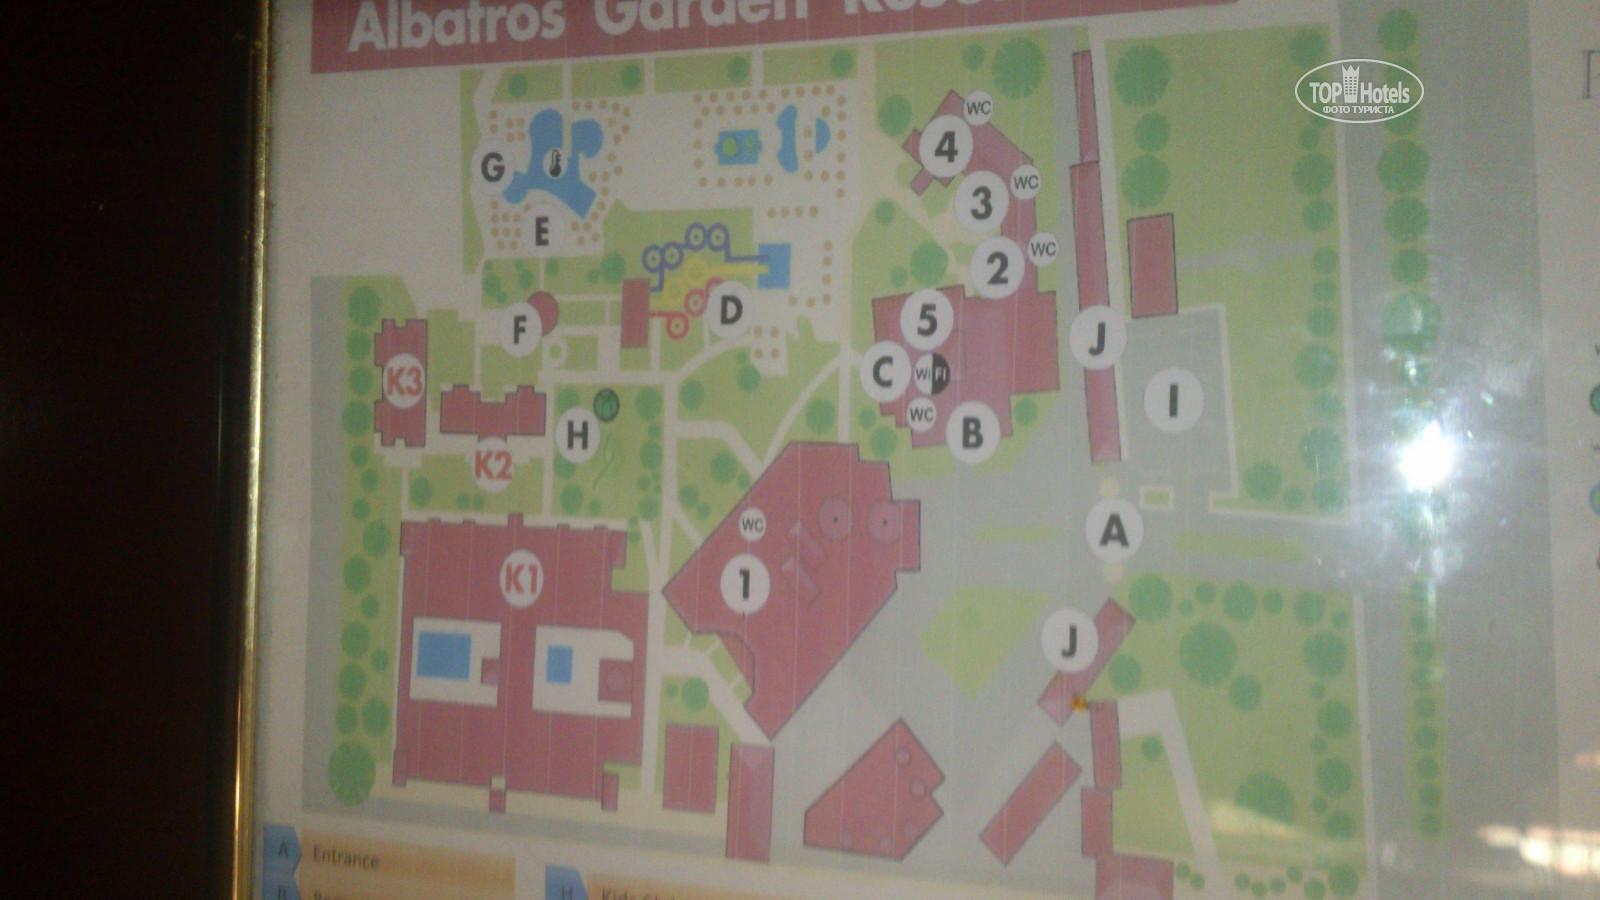 All photos: Hotel map отеля Albatros Aqua Park 4*. Rating of world ...